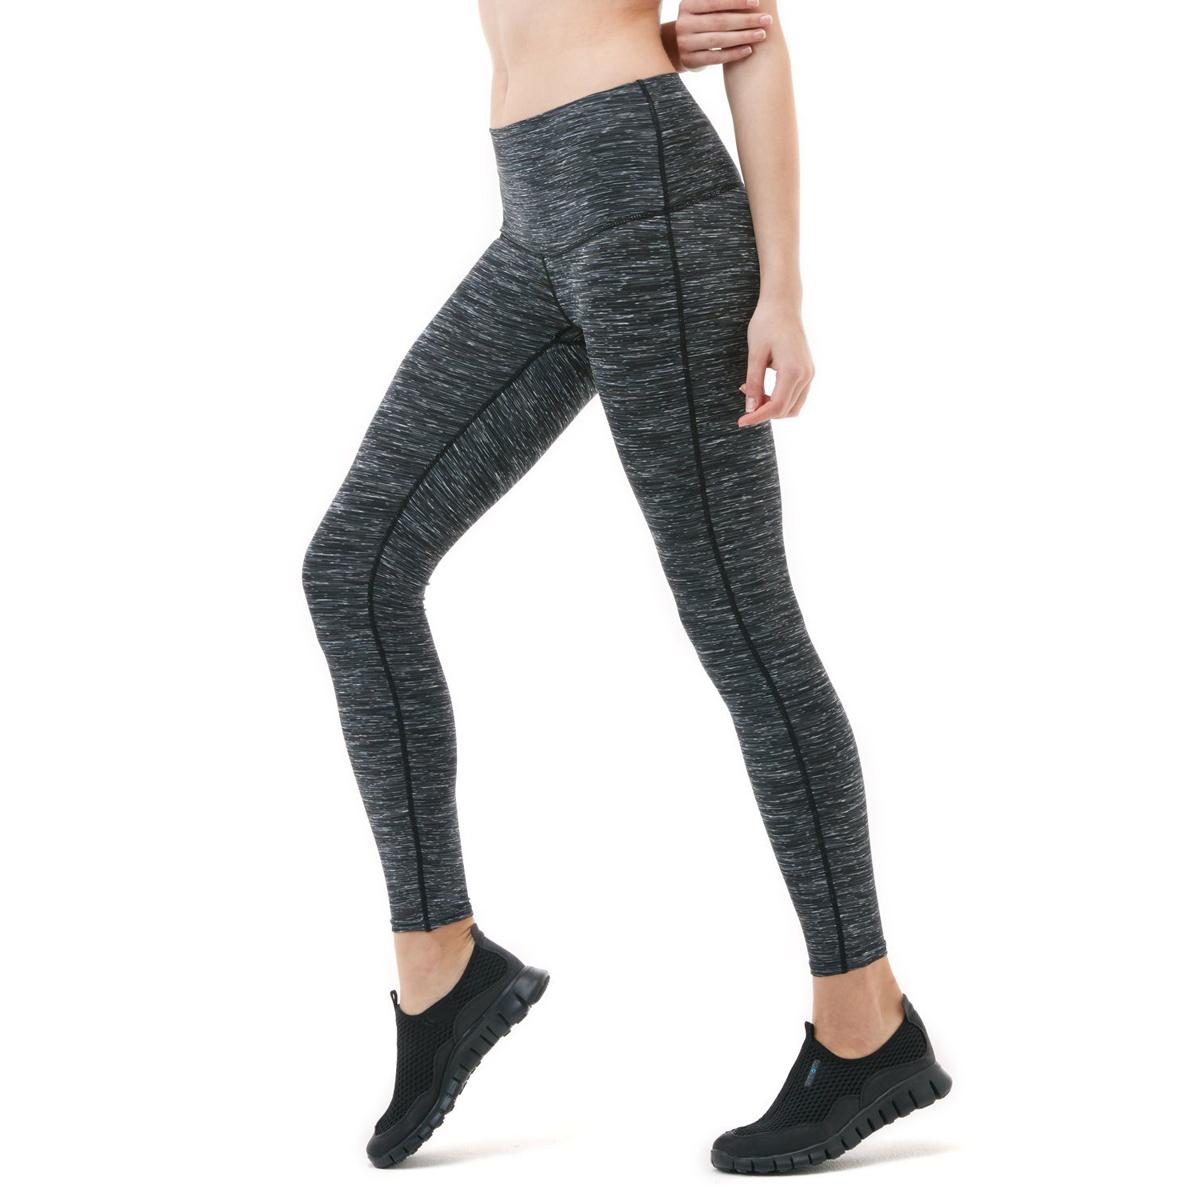 thumbnail 81 - TSLA Tesla FYP42 Women's High-Waisted Ultra-Stretch Tummy Control Yoga Pants